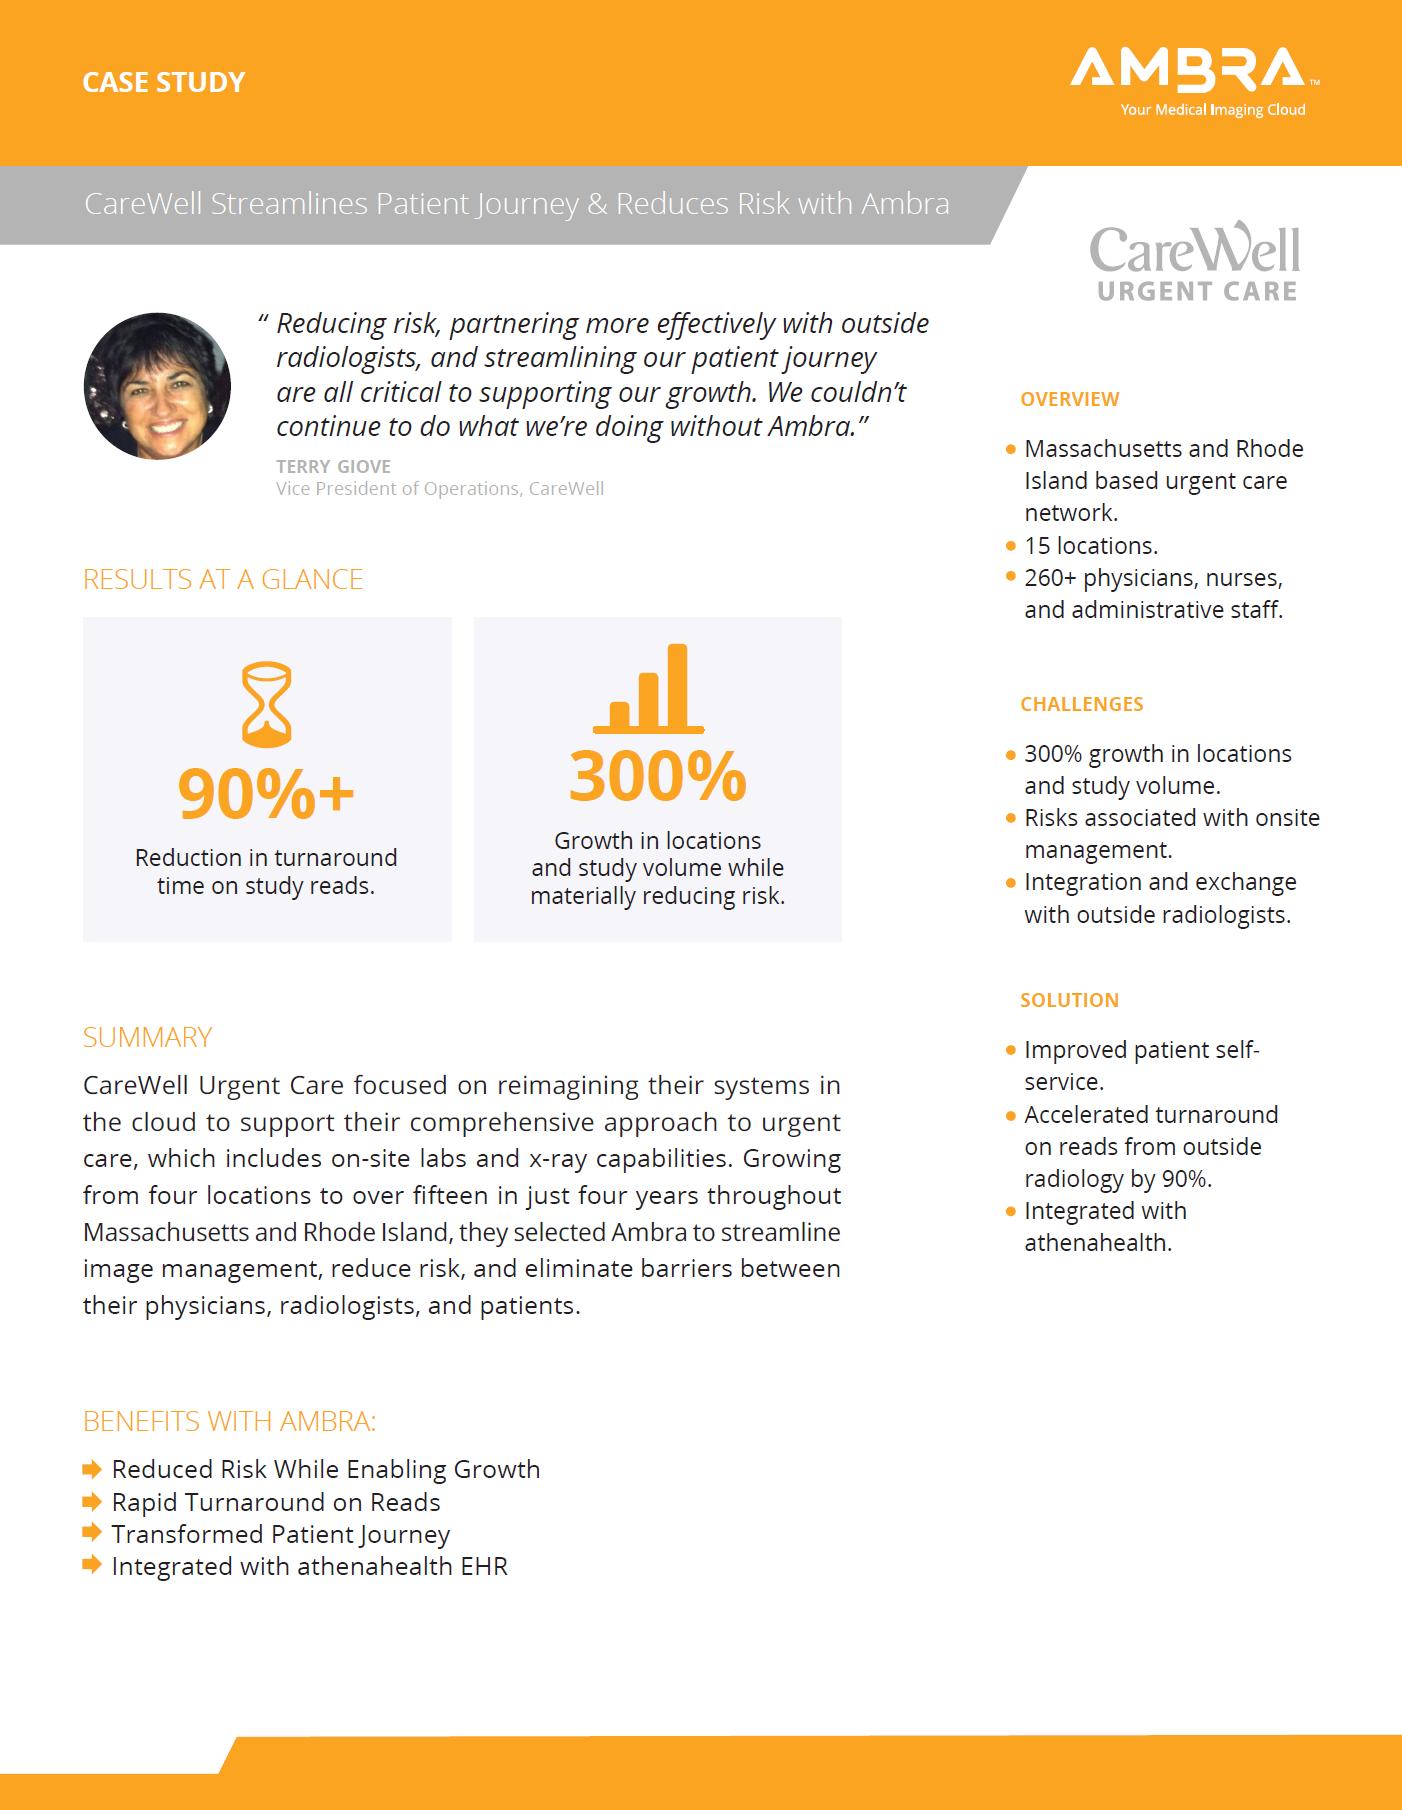 Data-driven case study